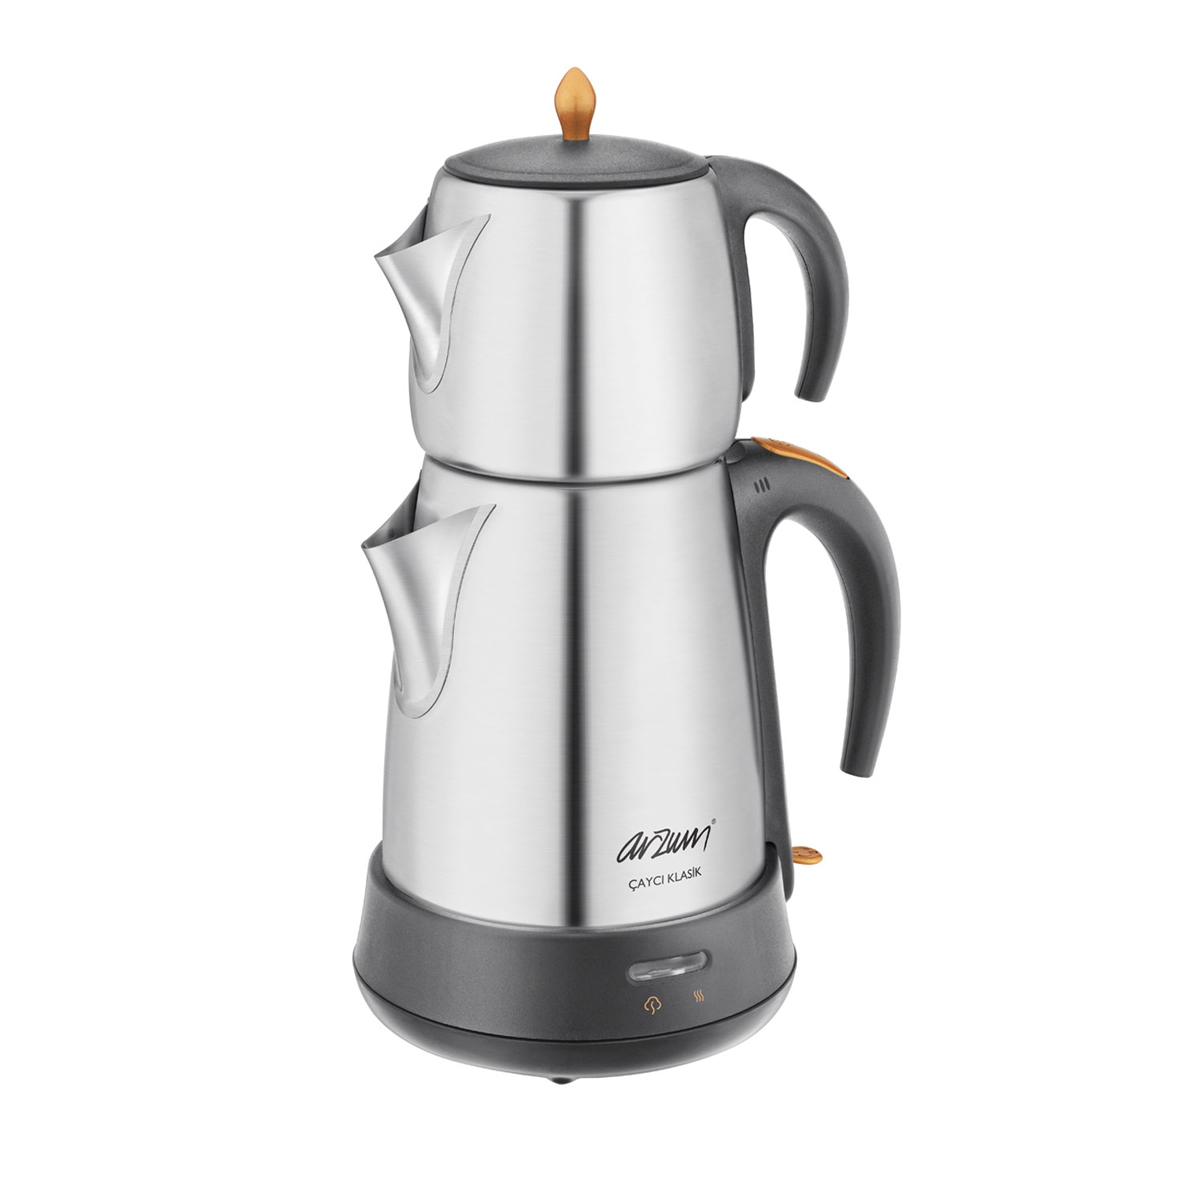 Arzum Çaycı Klasik Çay Makinesi - Inox - Thumbnail